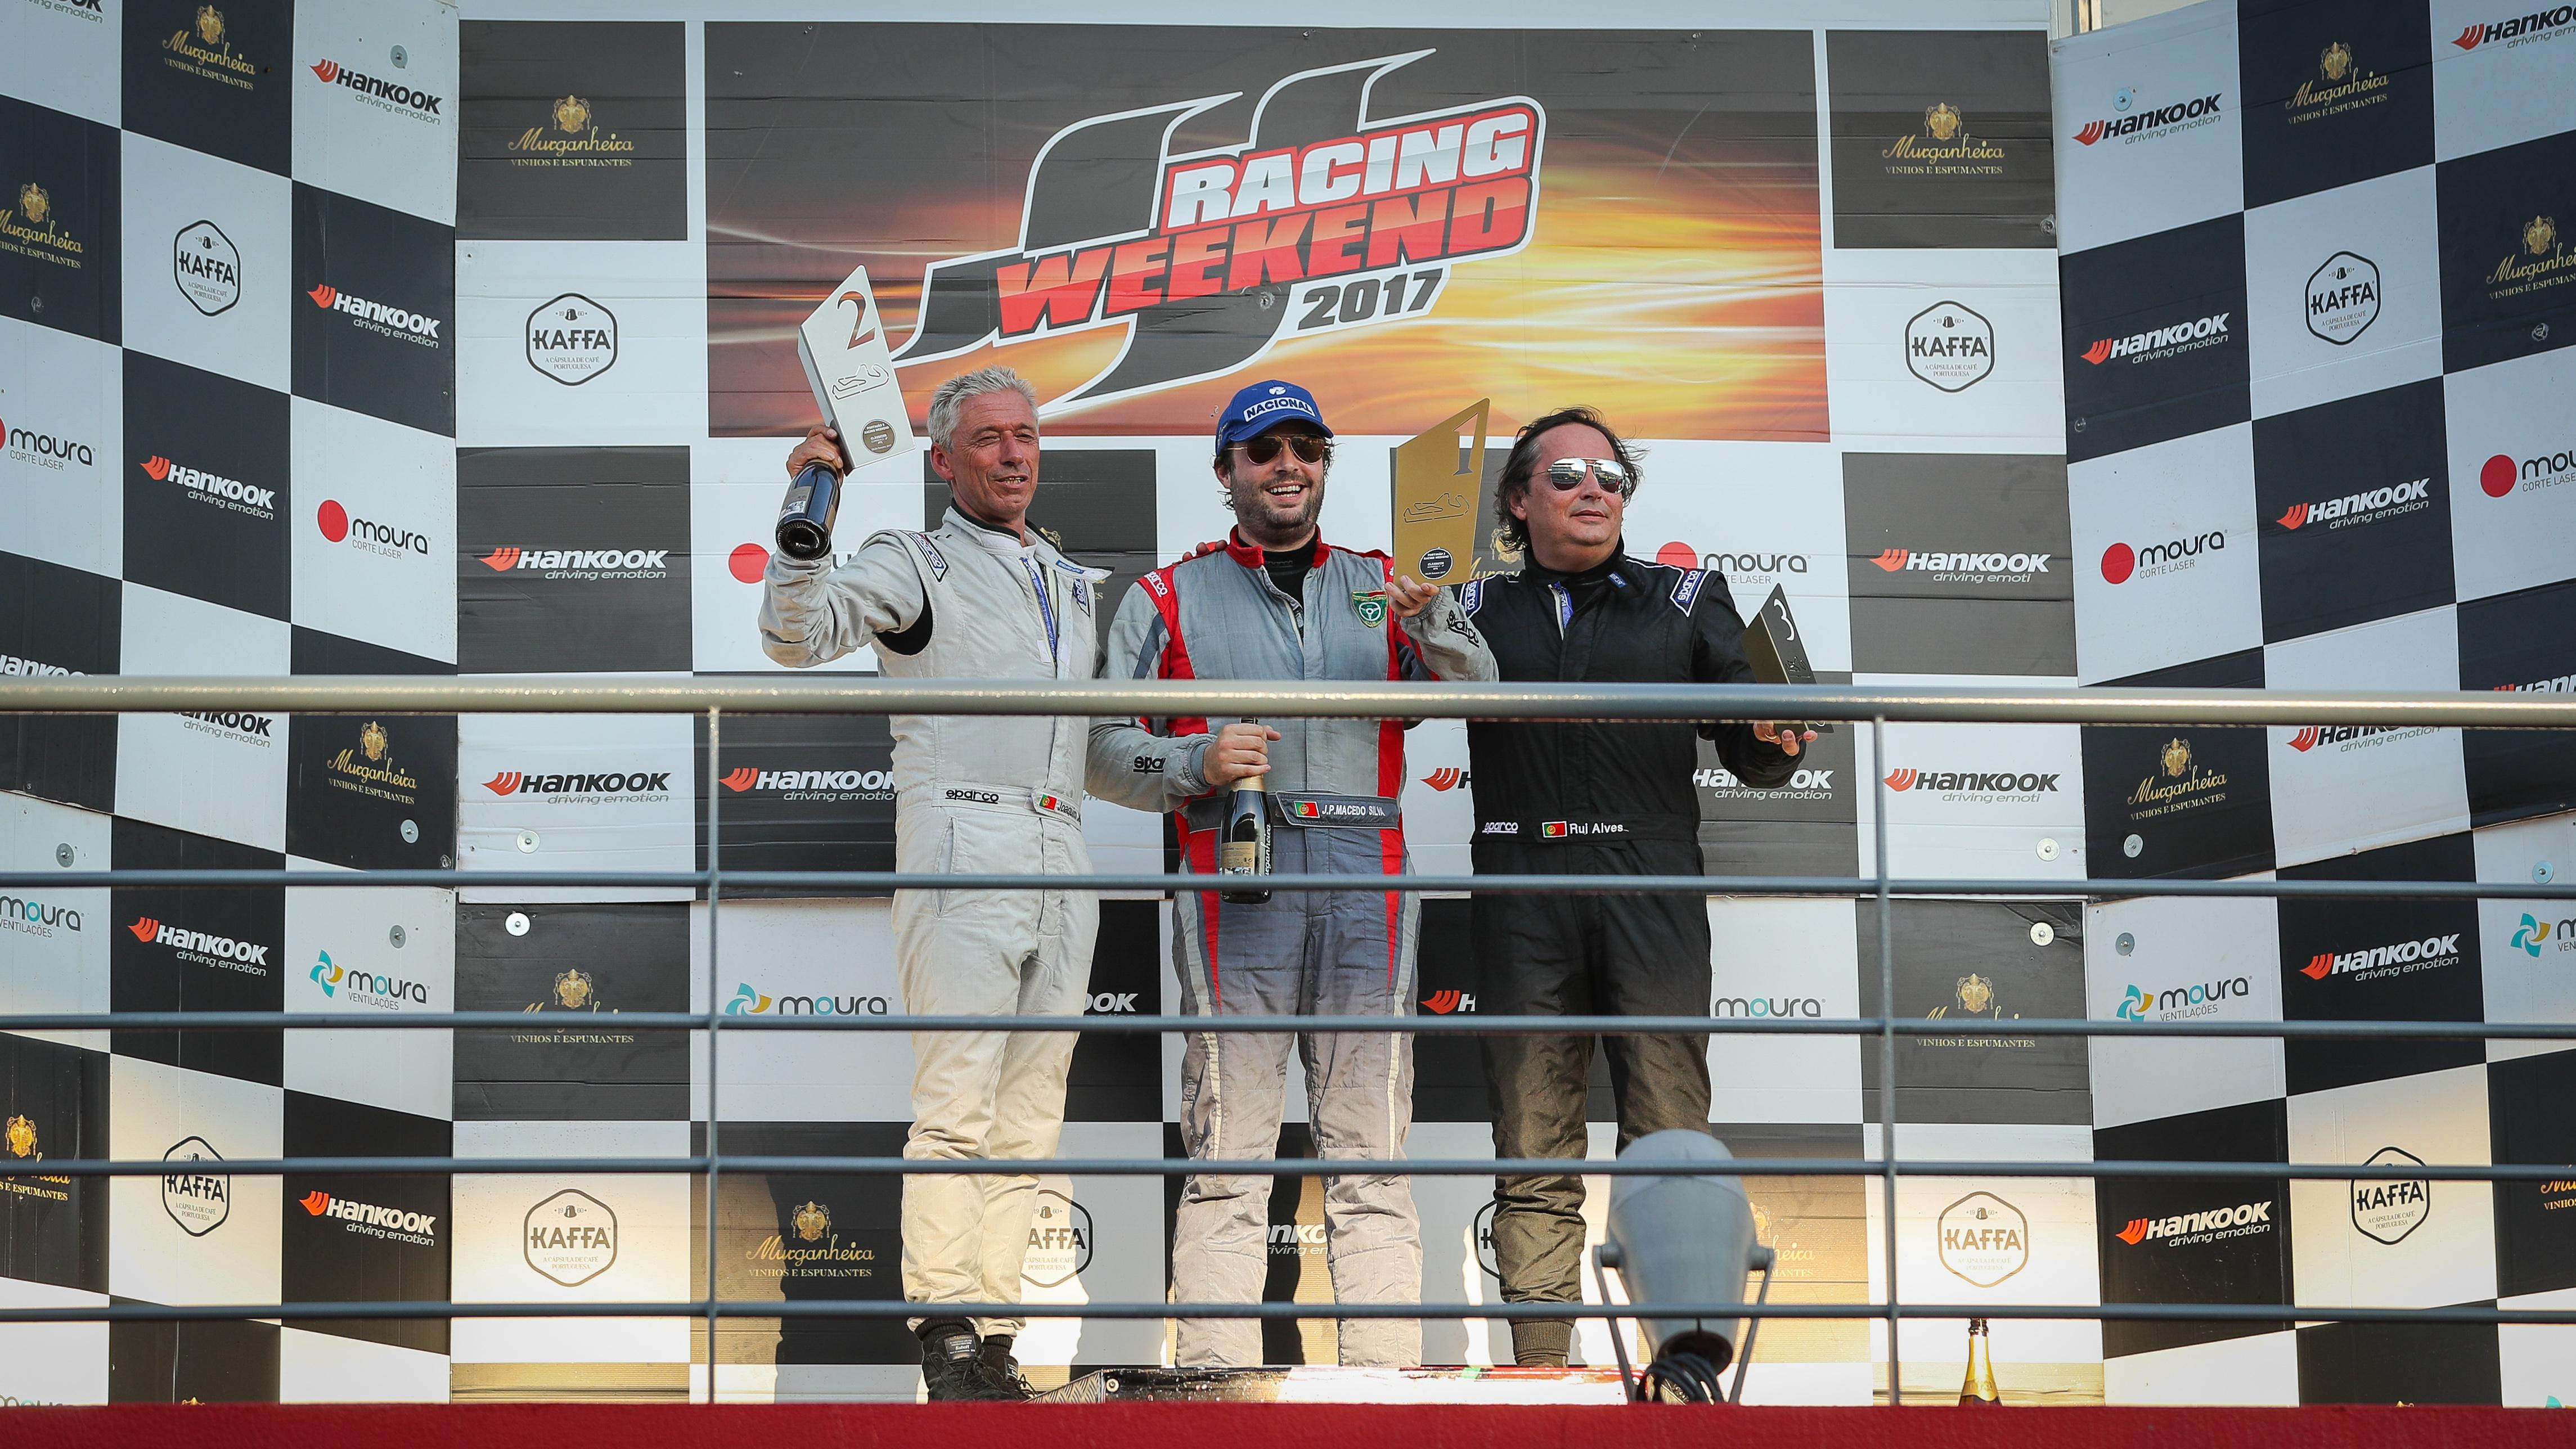 portimao podium cncc